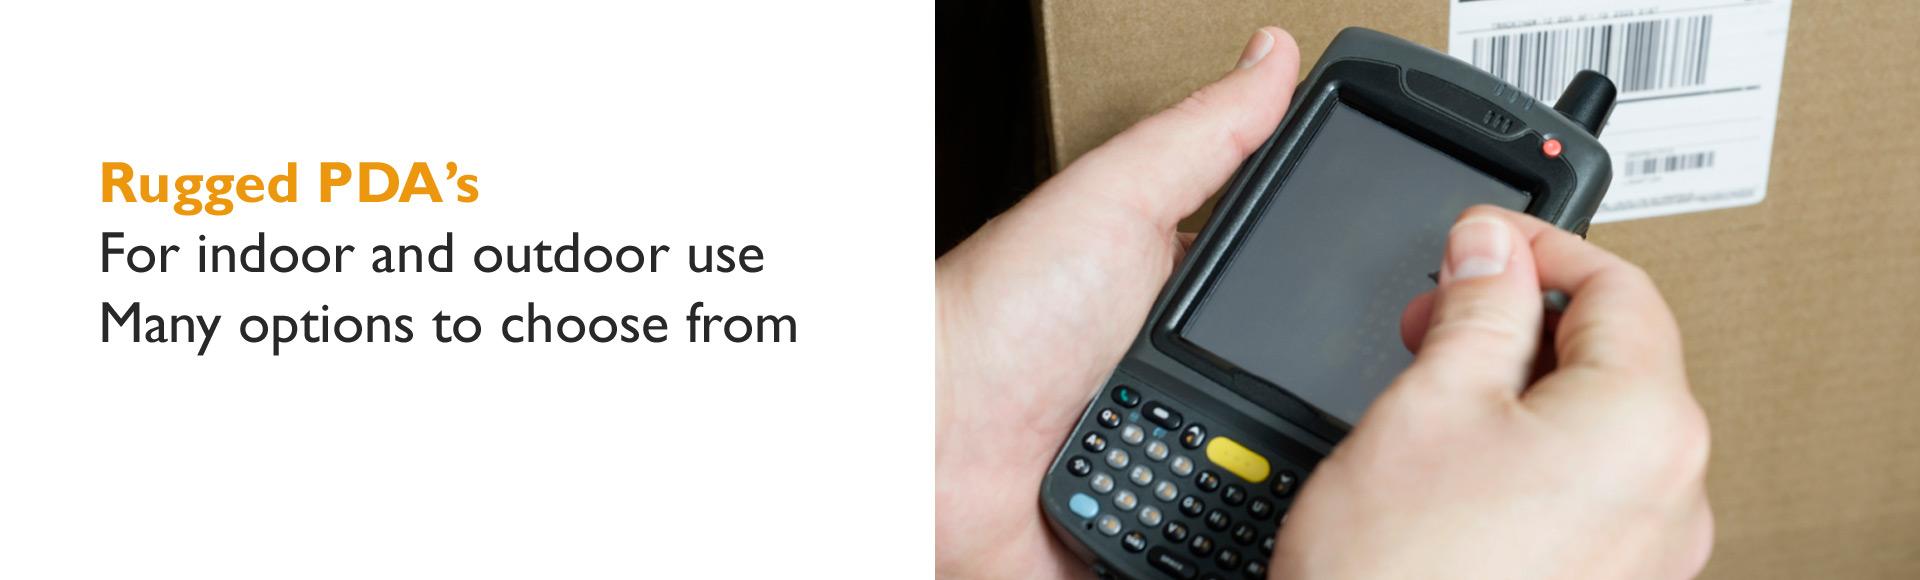 Rugged PDA's